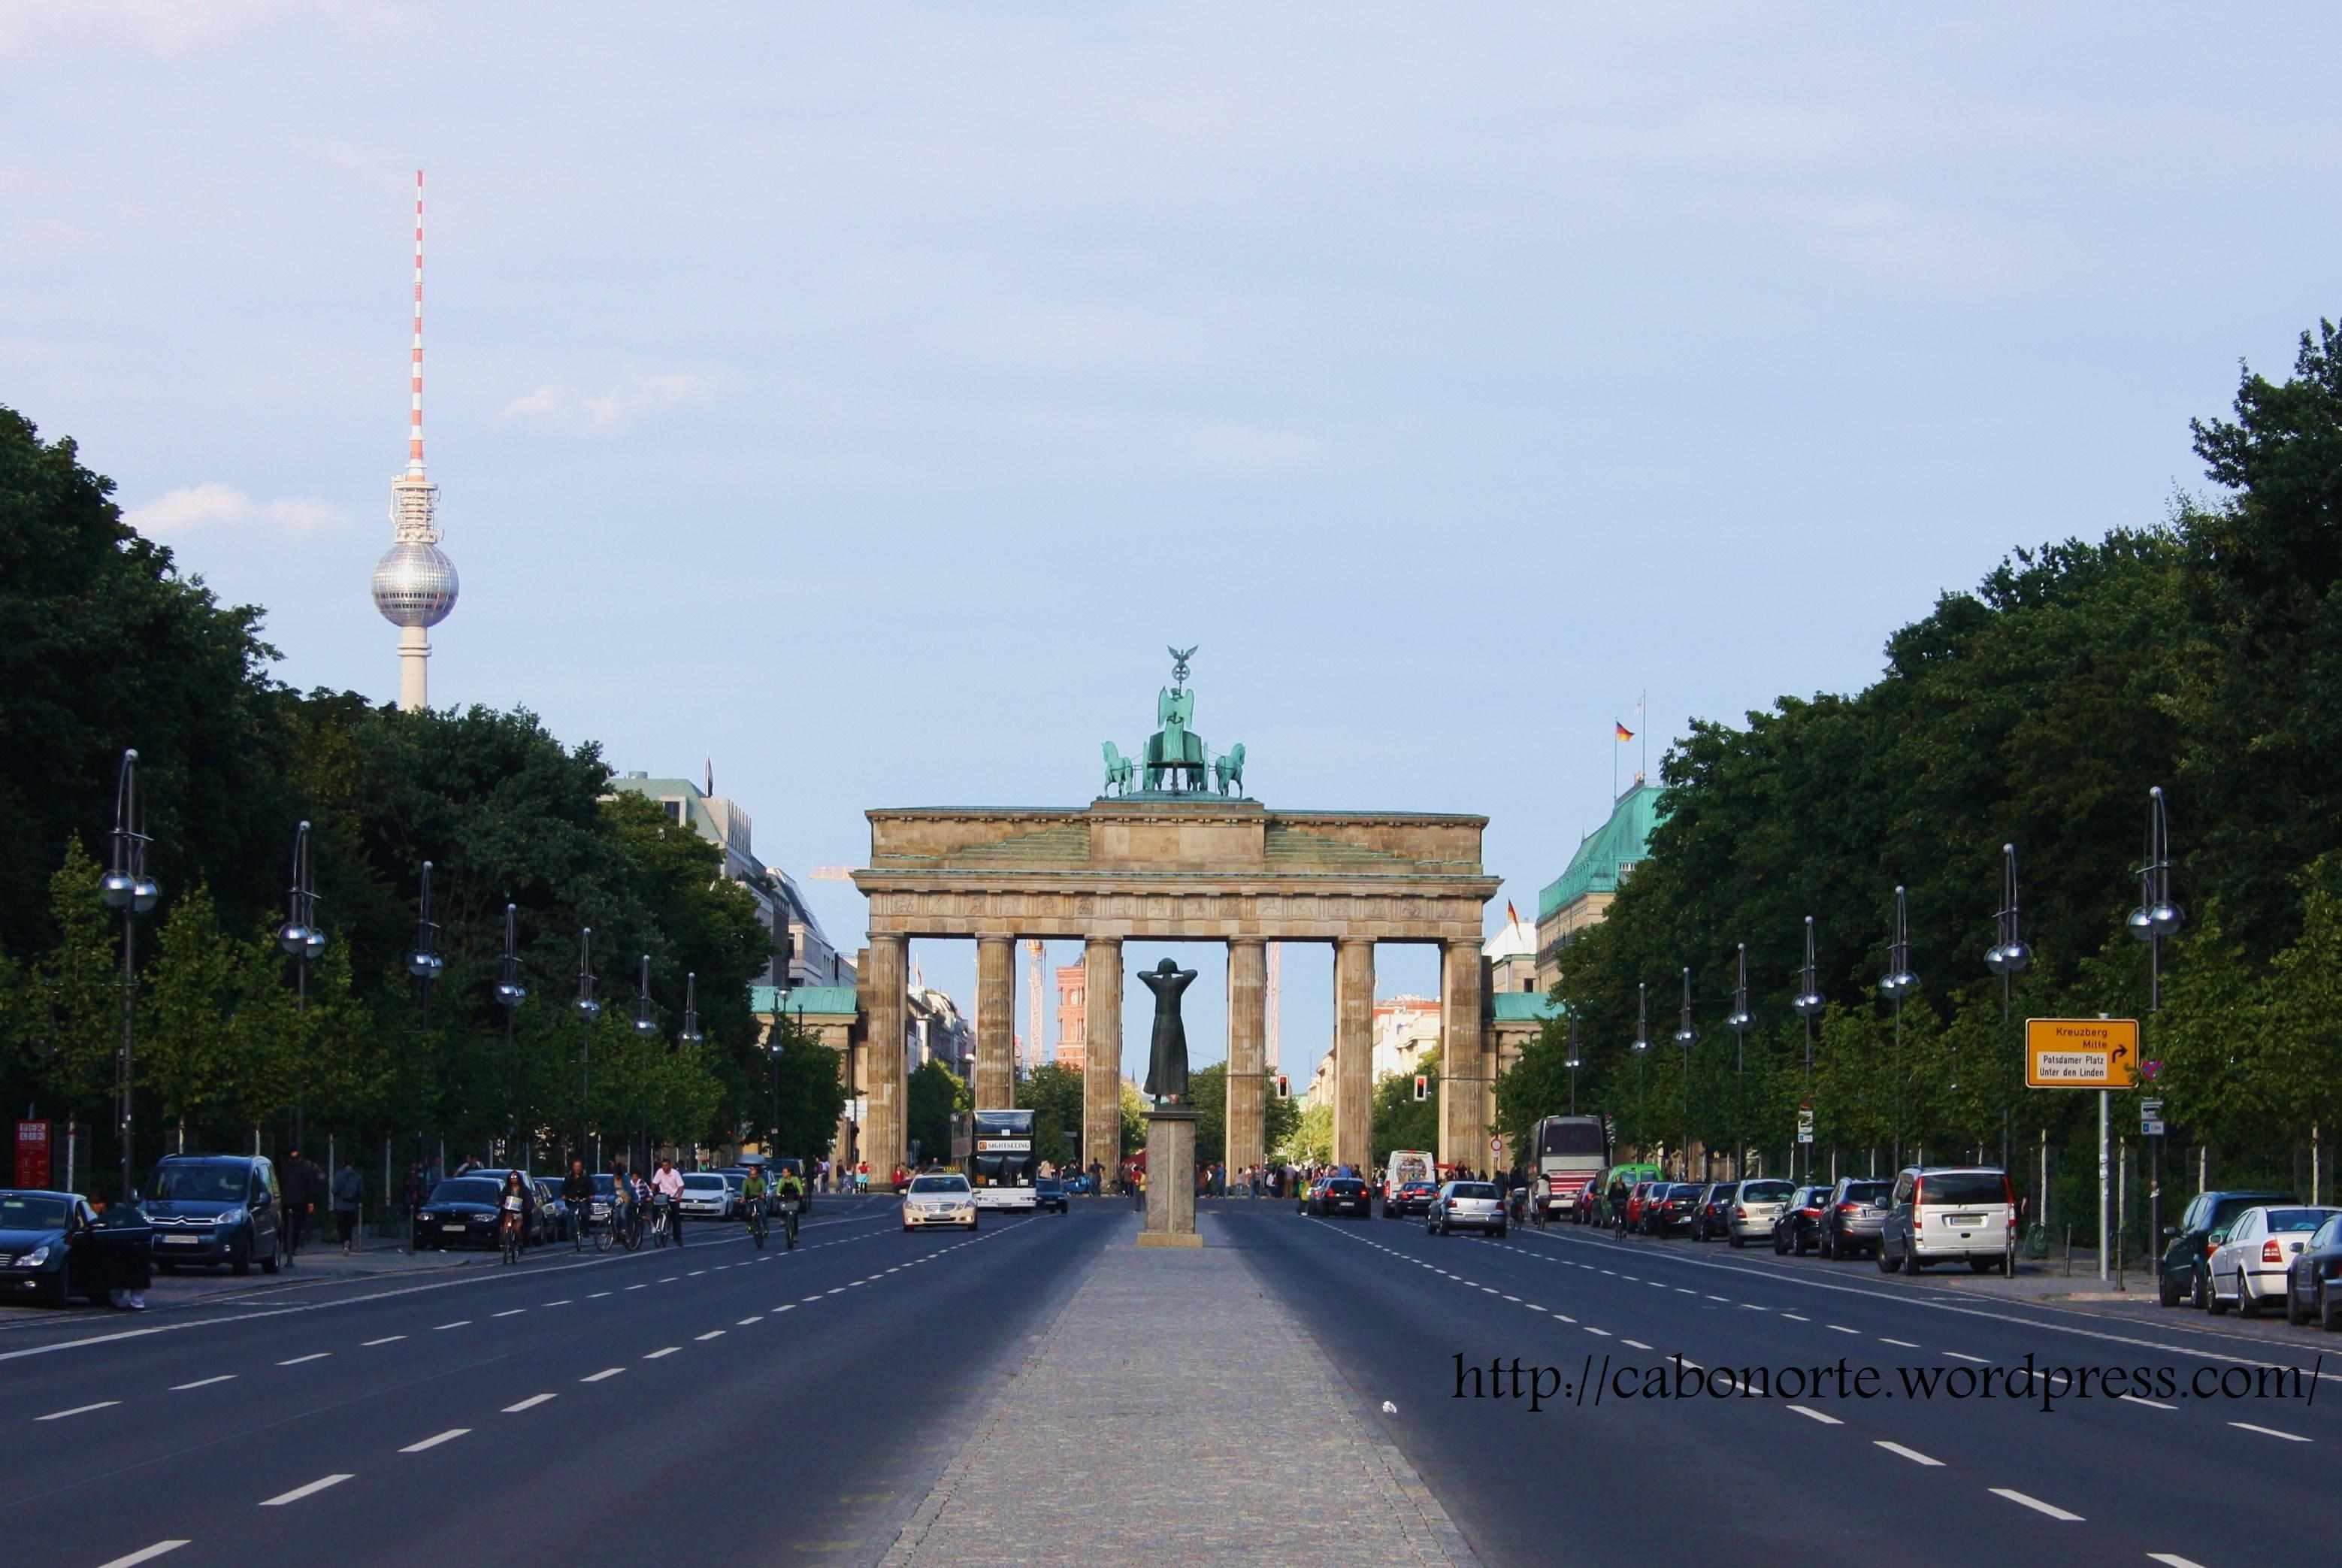 The Branderburg Gate